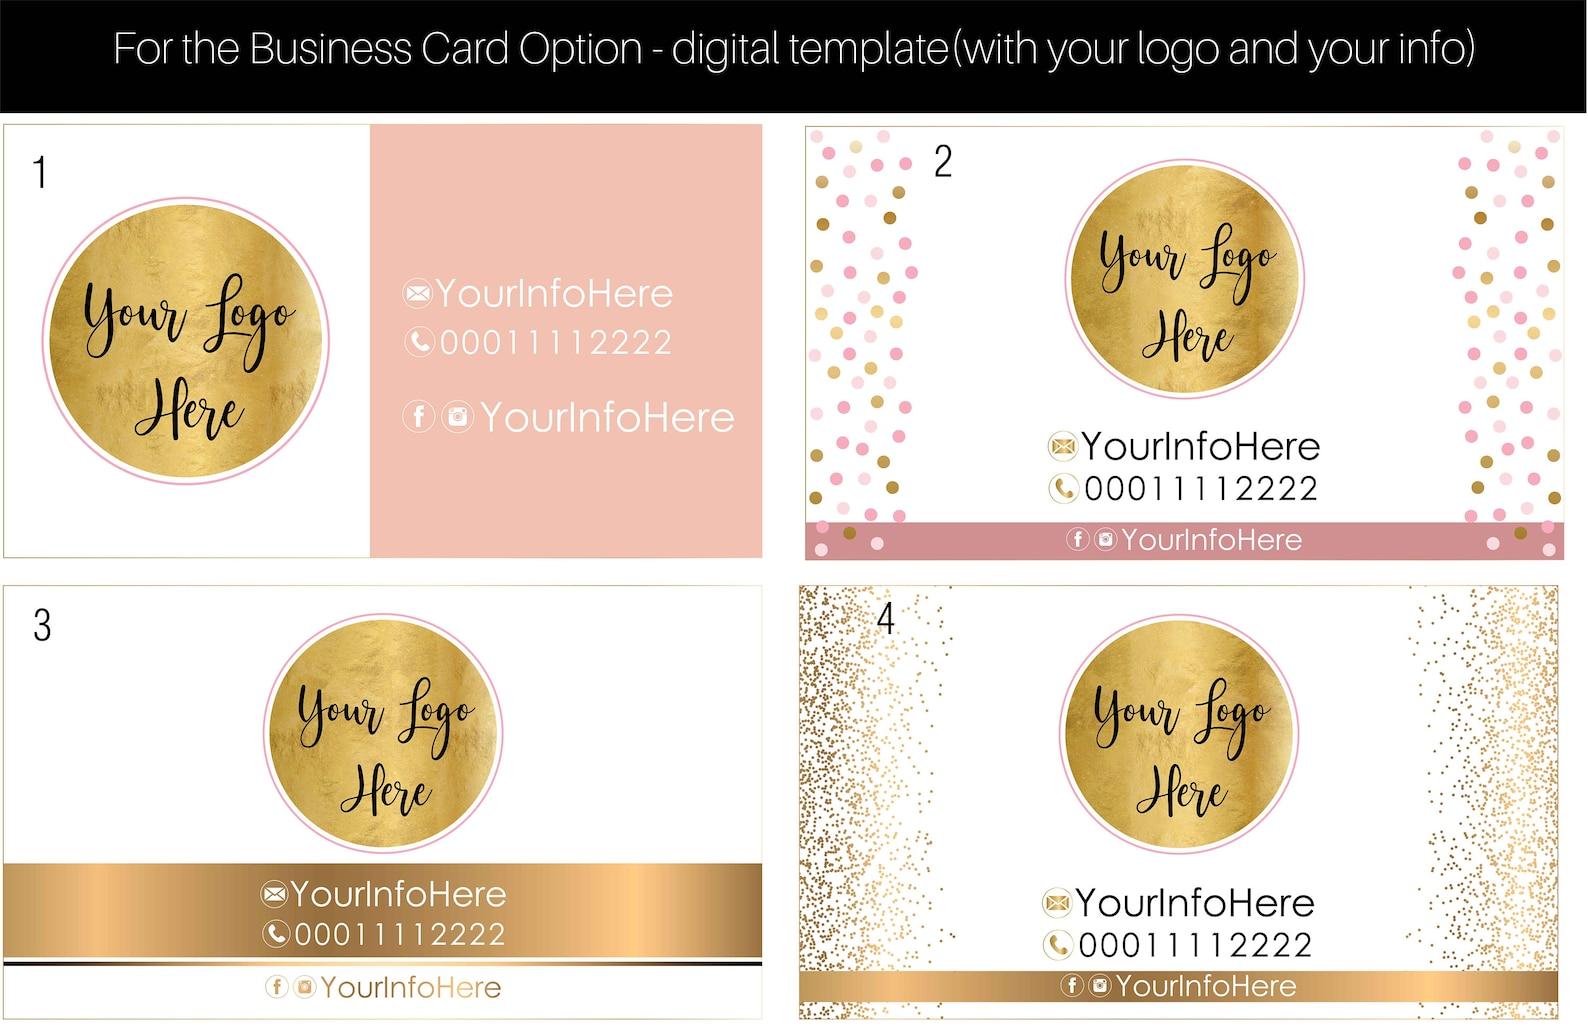 custom logo design, gold logo and watermark, ballerina pink gold logo, ballet shoes logo, pink gold ballet shoes logo, ballet fl